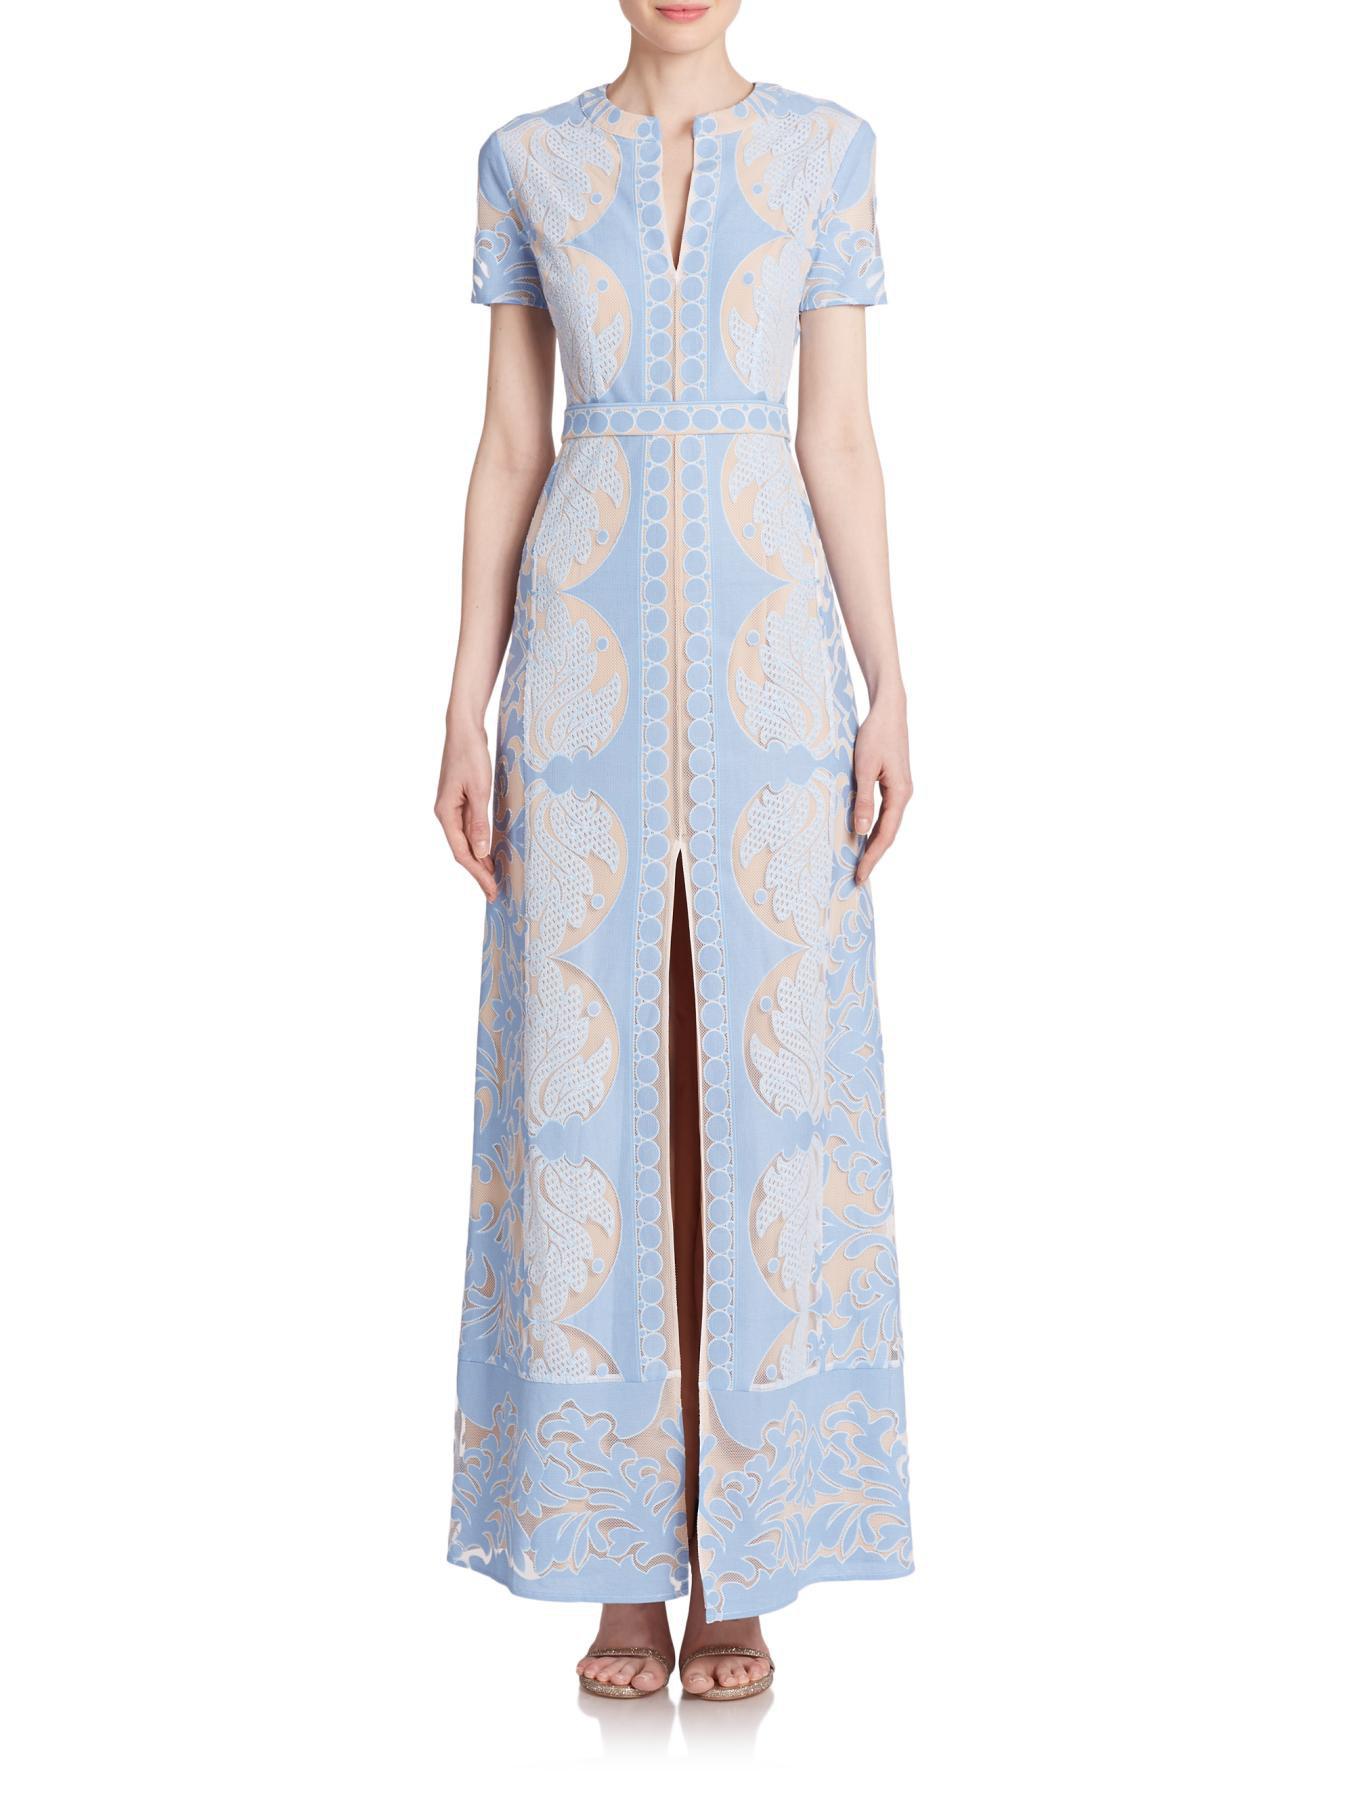 Bcbg london maxi dress